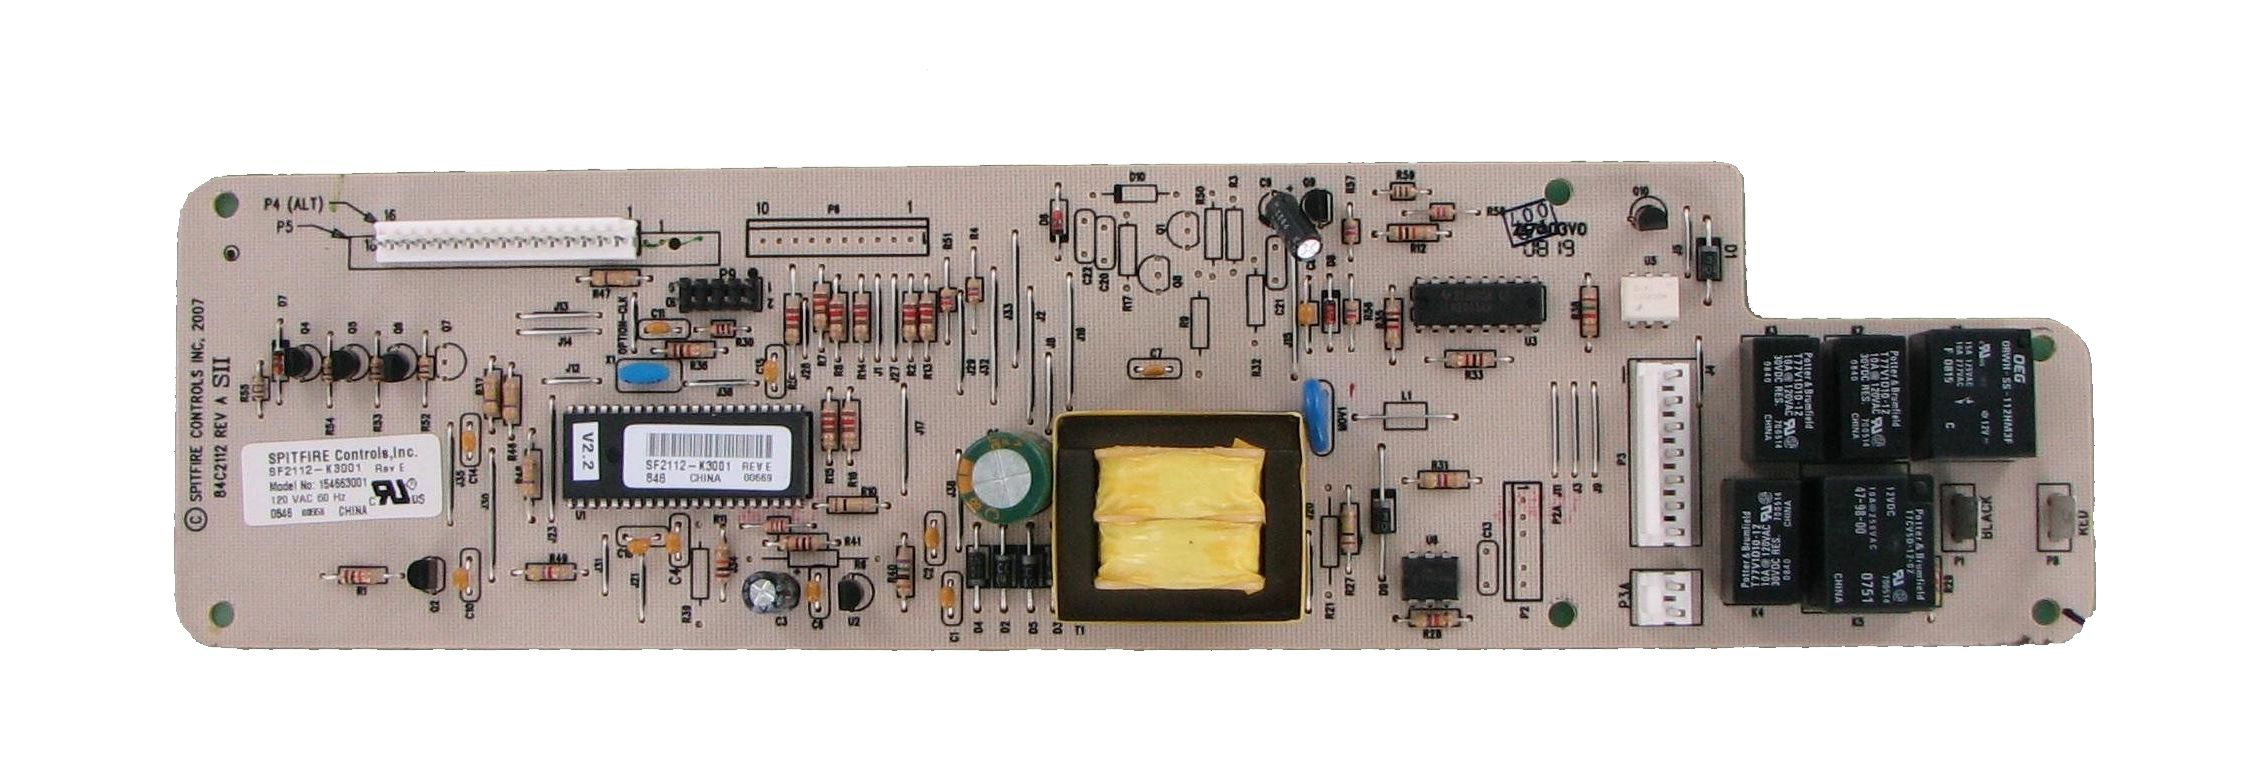 Frigidaire Electrolux 154663001 Dishwasher Control Board Broken Appliance Frigidaire Boards